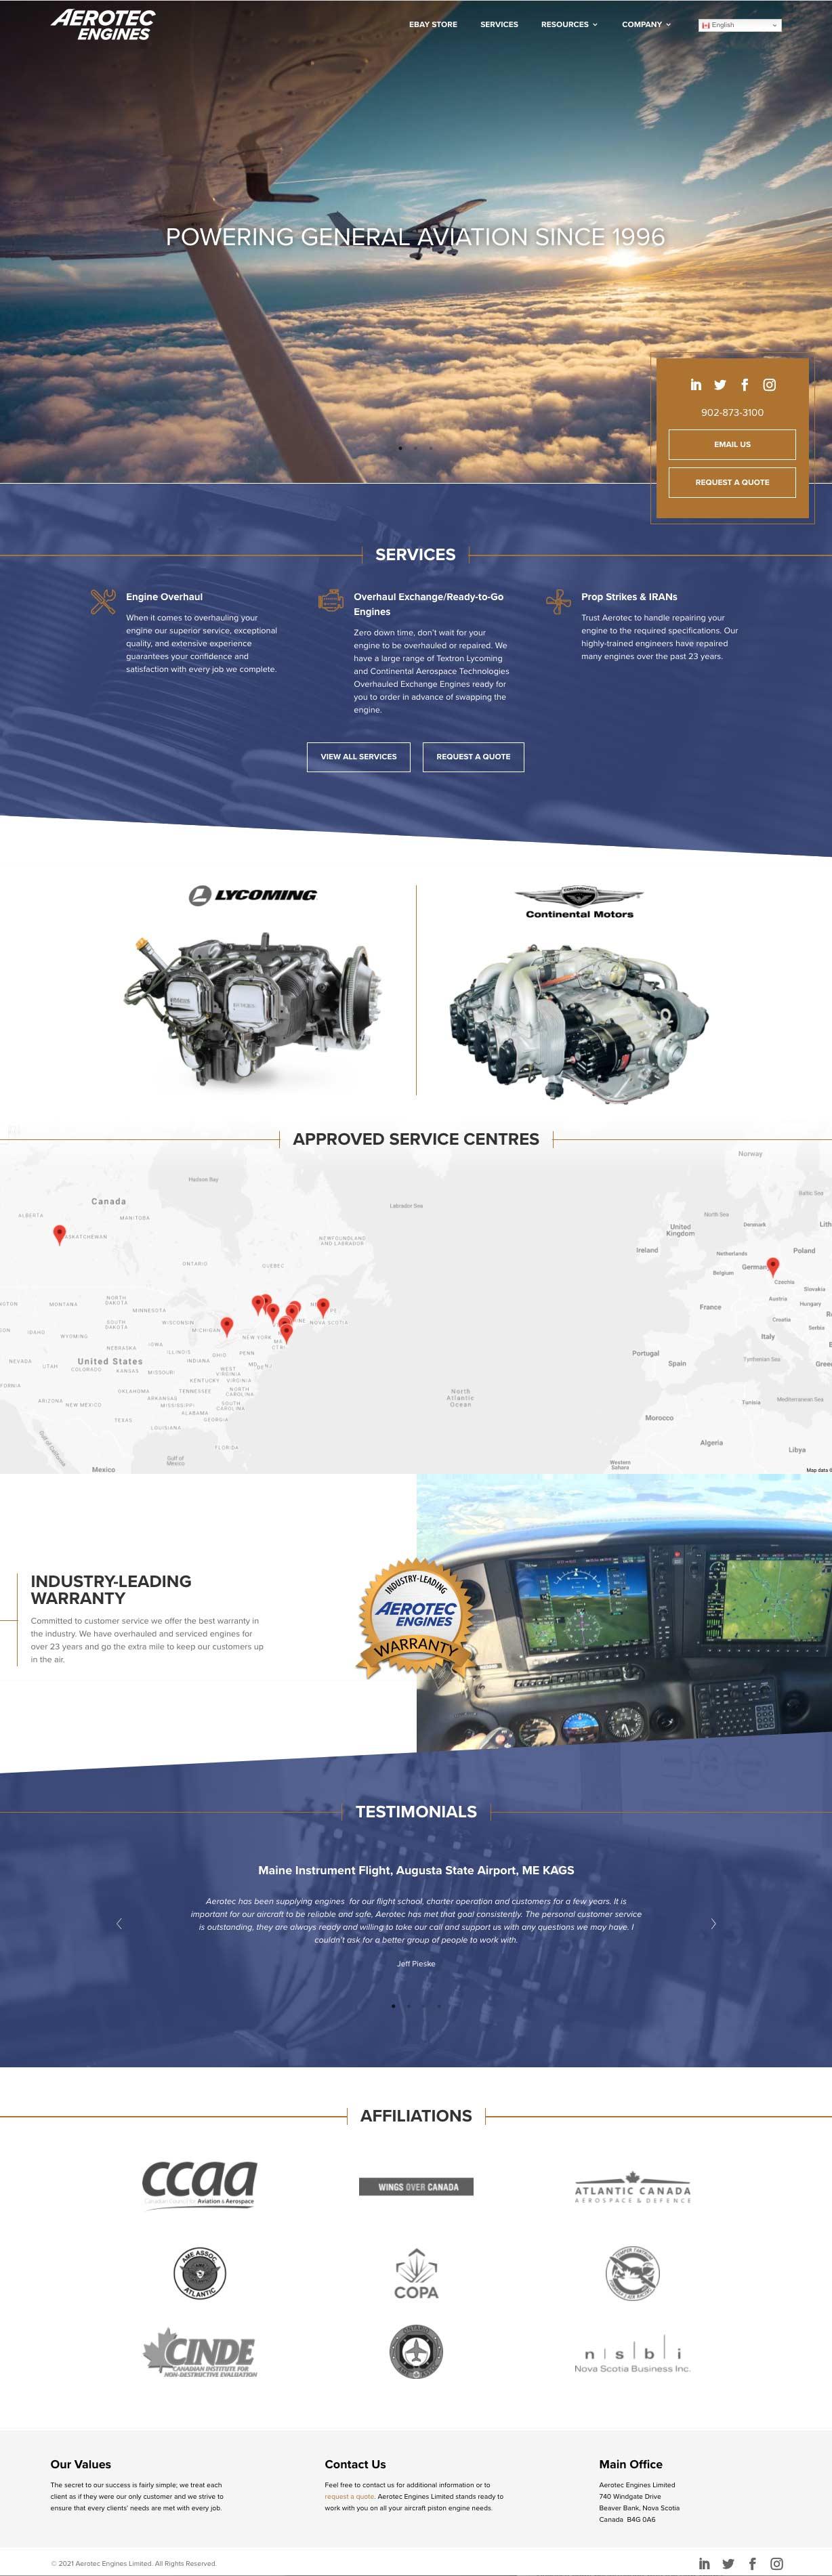 Aerotec Engines